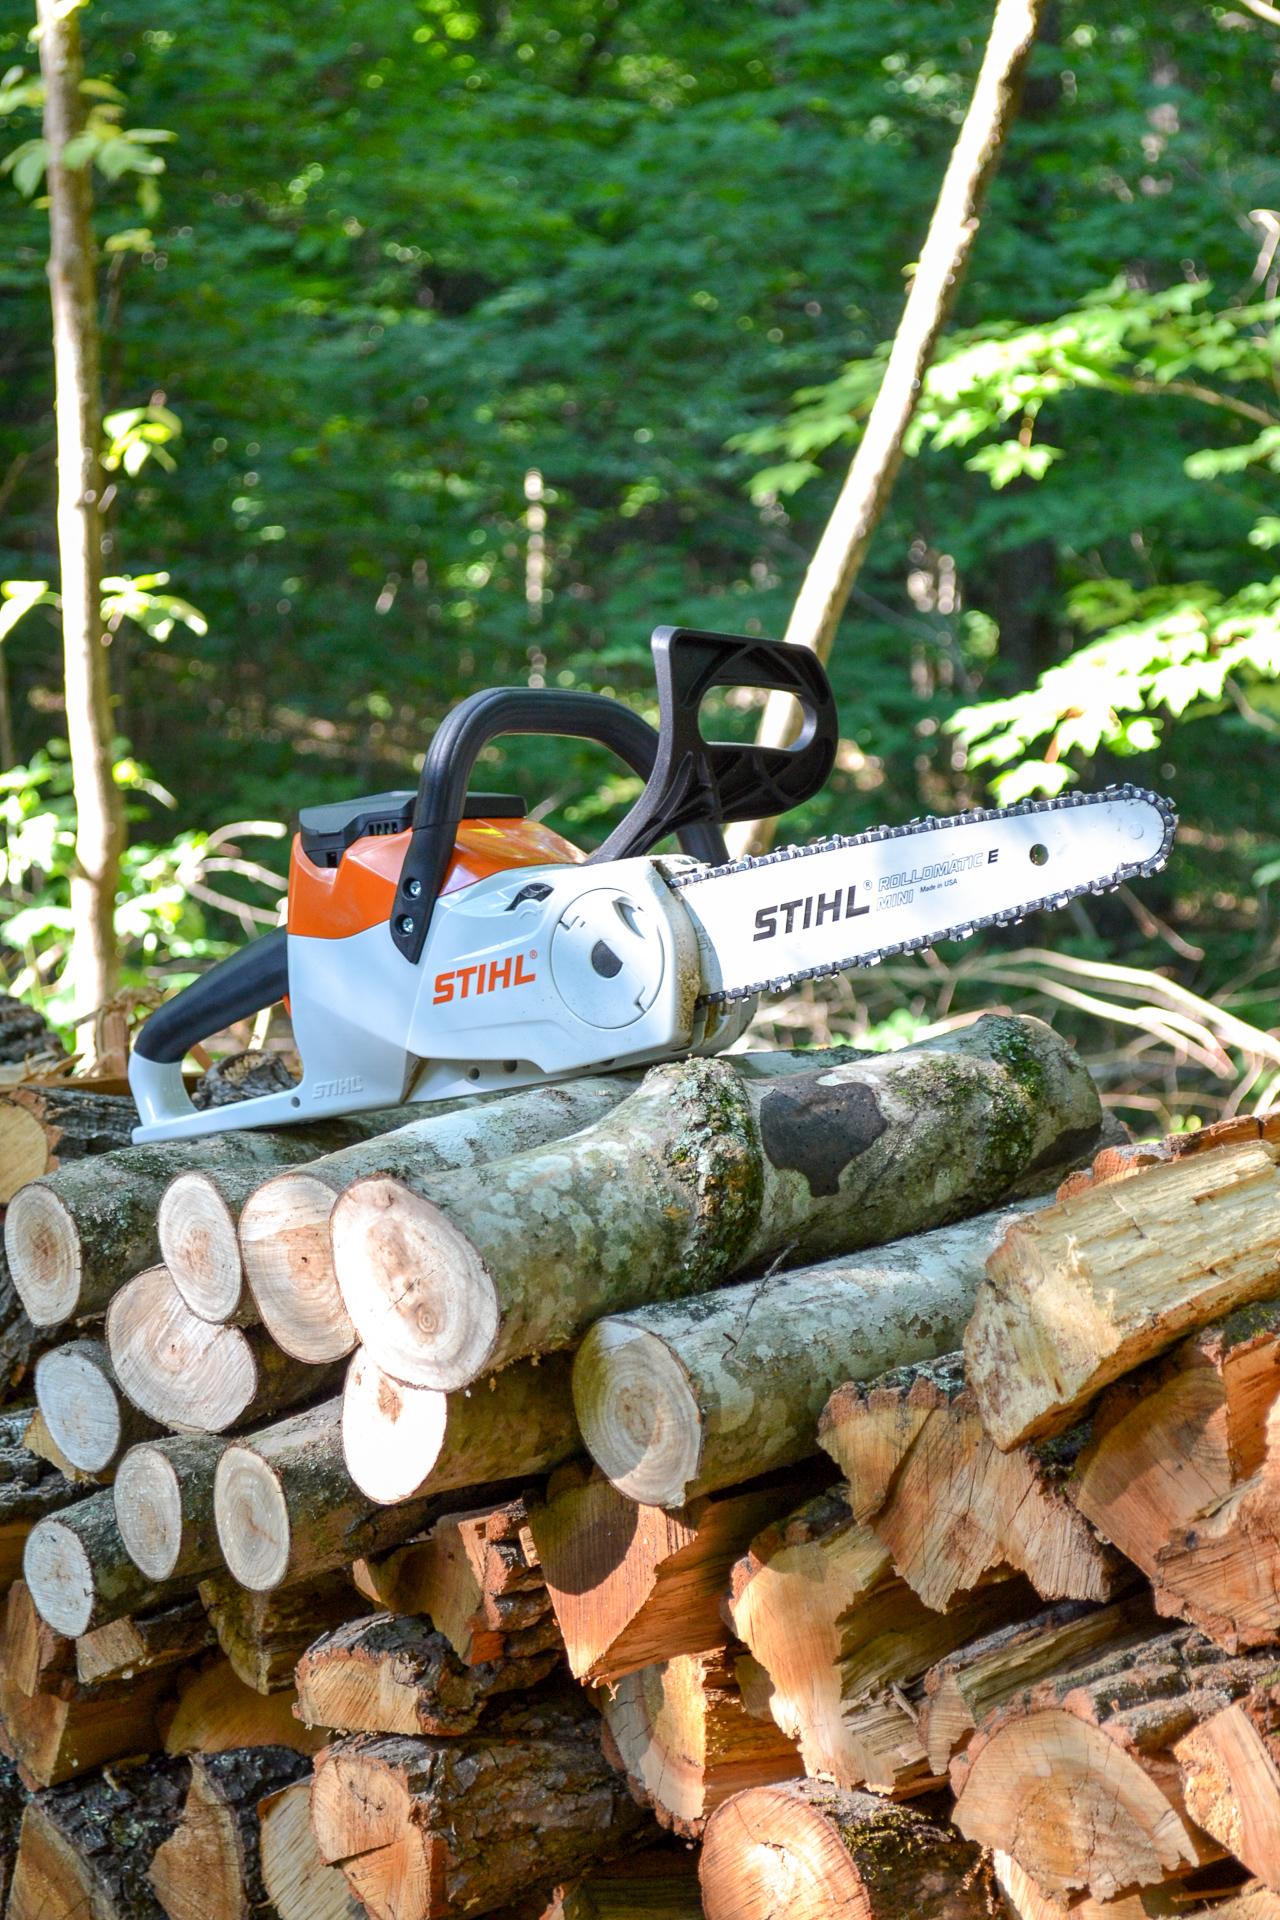 STIHL chainsaw on woodpile - 3